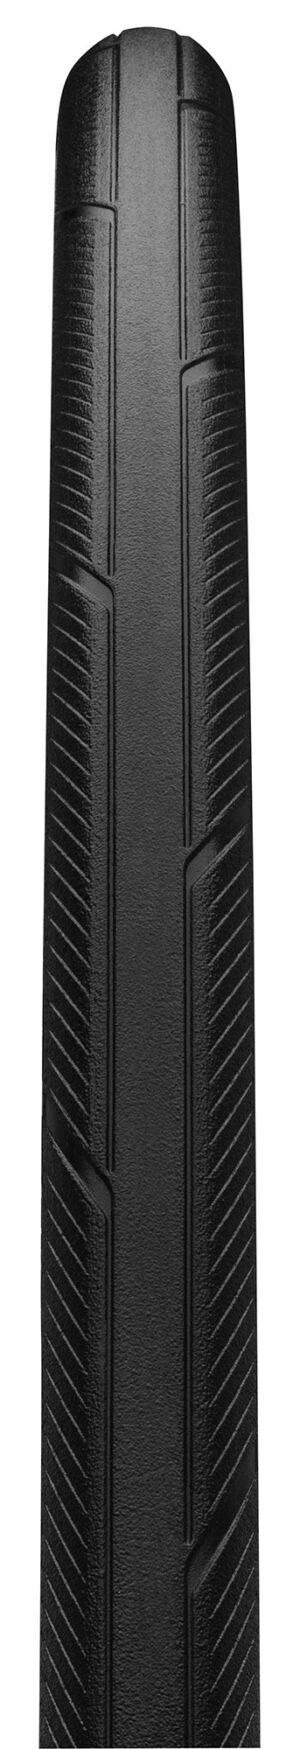 Anvelopa Continental UltraSport III 23-622 negru/negru SL - Wheelsports